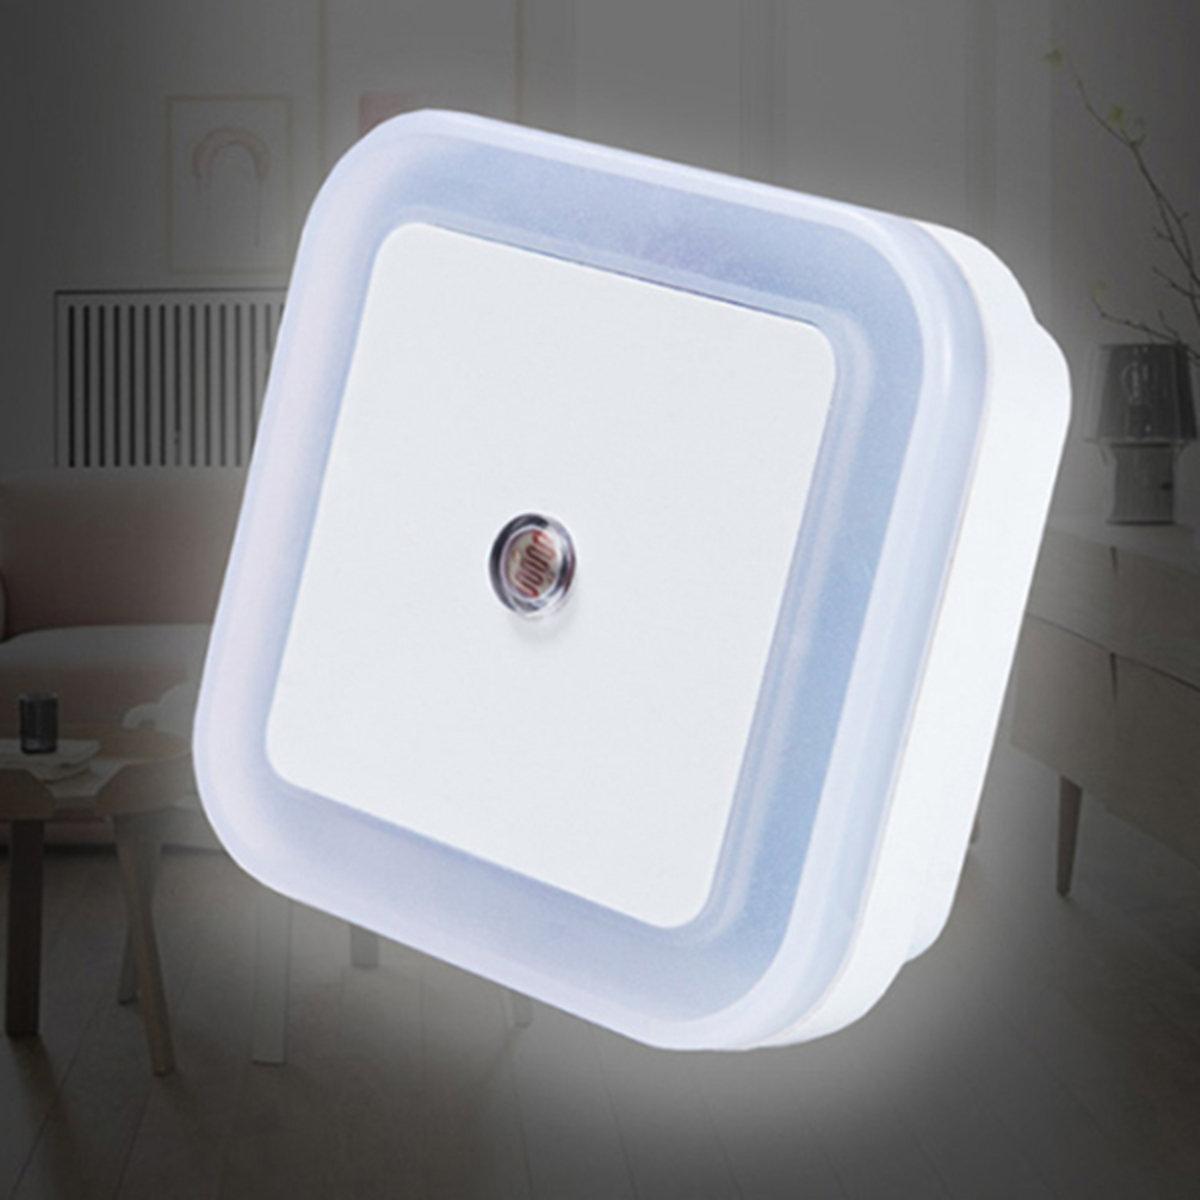 LED light control induction night light (6 packs)